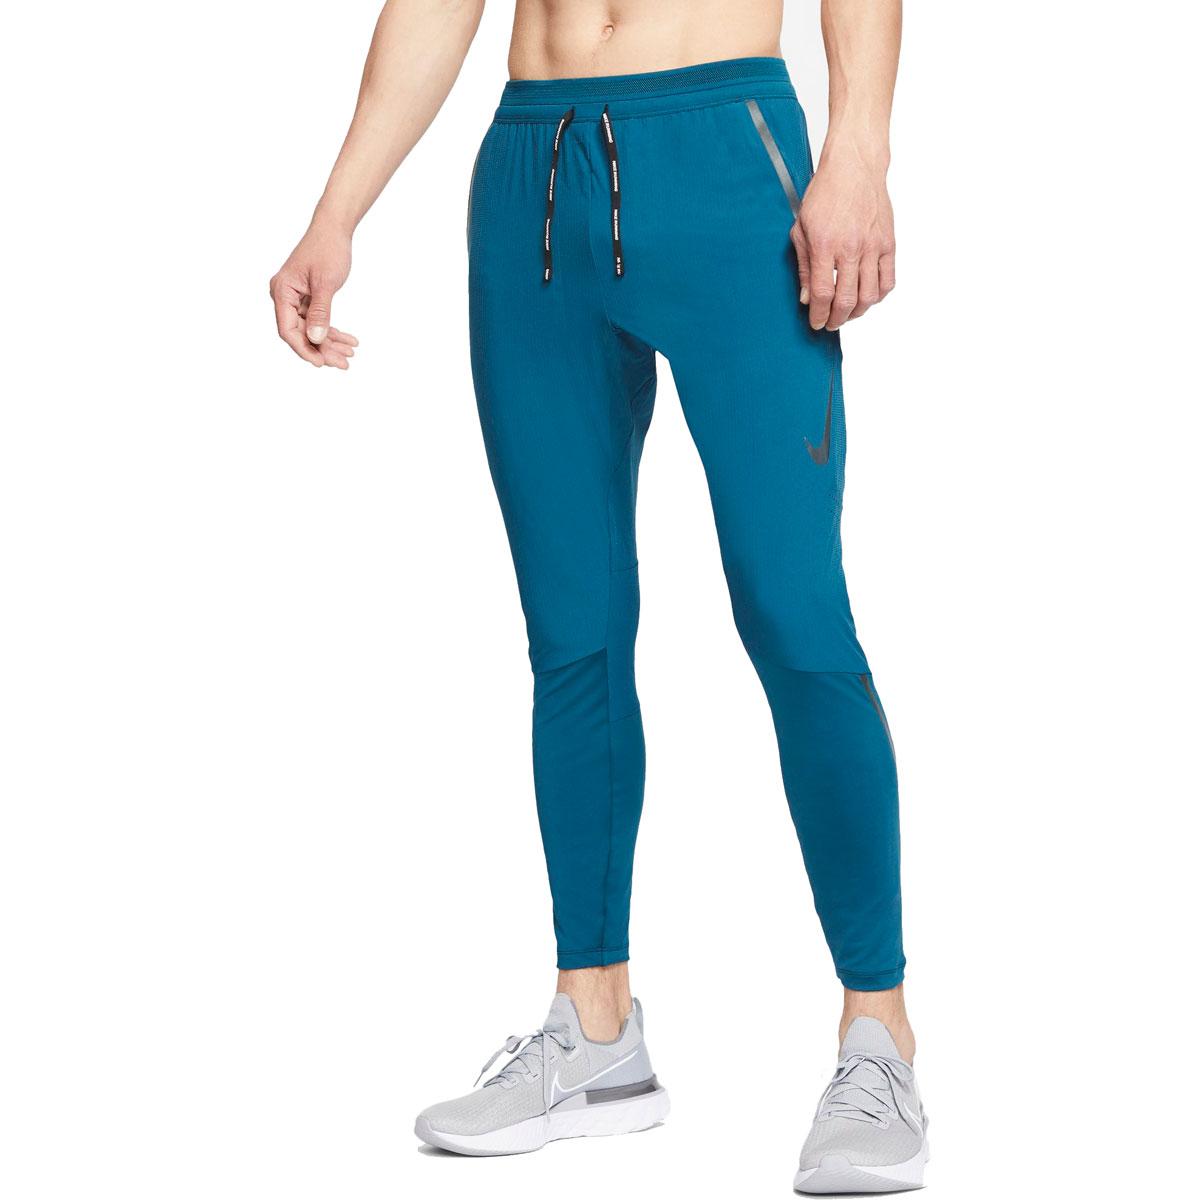 Men's Nike Swift Running Pants - Color: Valerian Blue/Reflect Black - Size: S, Valerian Blue/Reflect Black, large, image 1